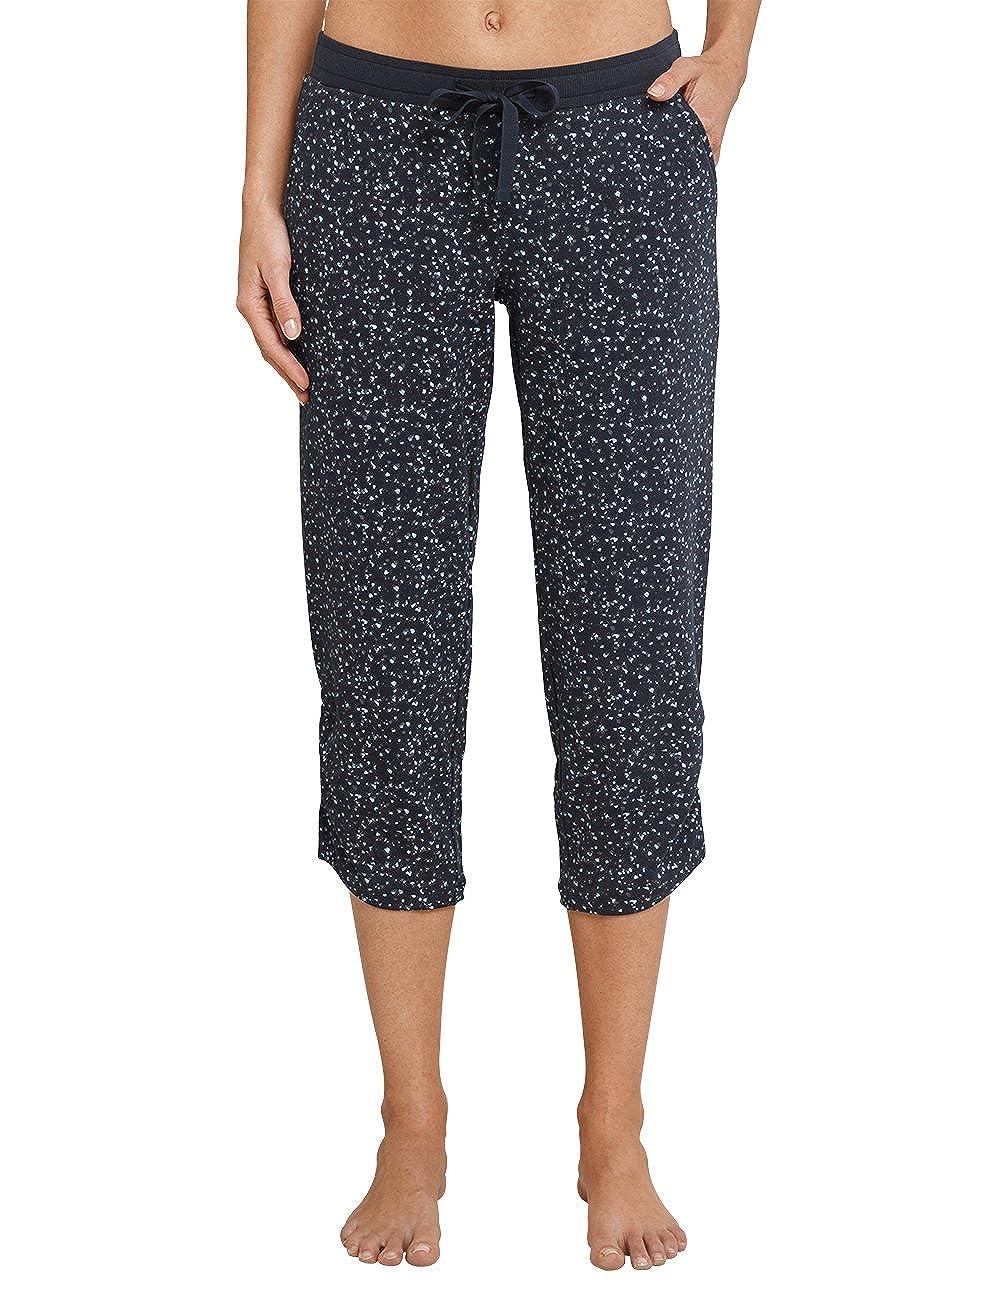 TALLA 40. Schiesser Pantalones de Pijama para Mujer